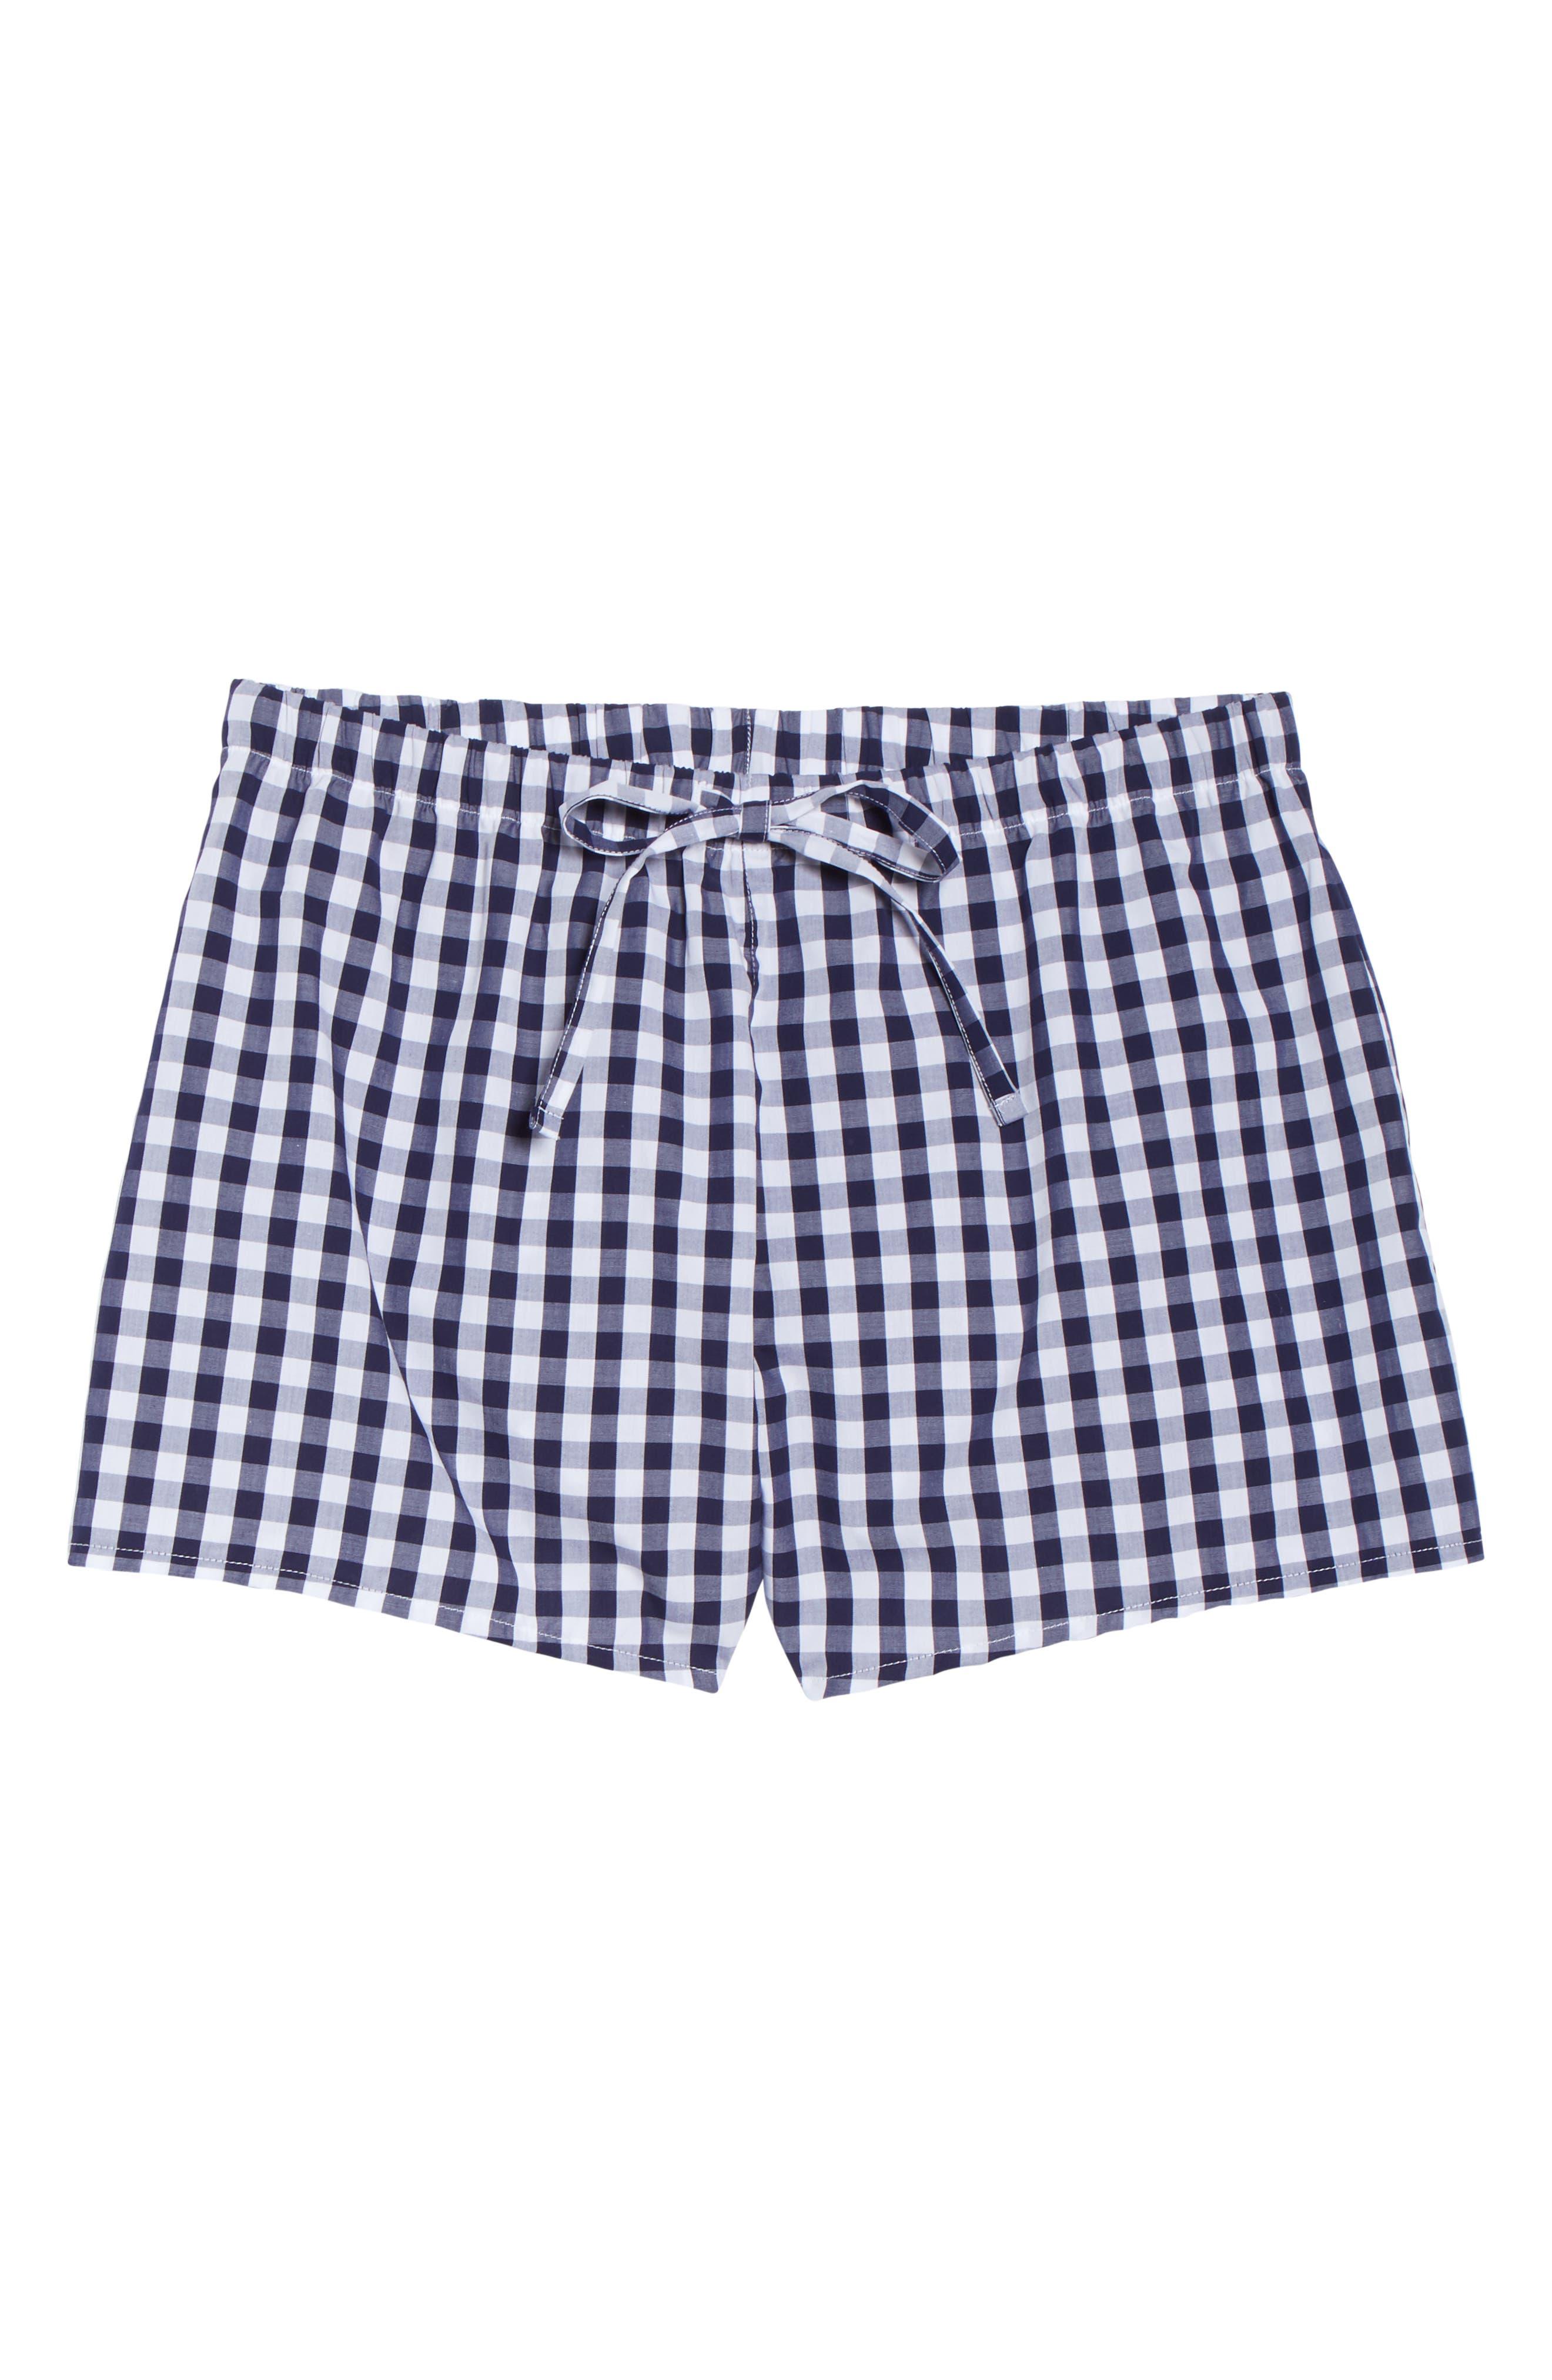 SLEEPY JONES Pajama Shorts in Large Gingham Blue